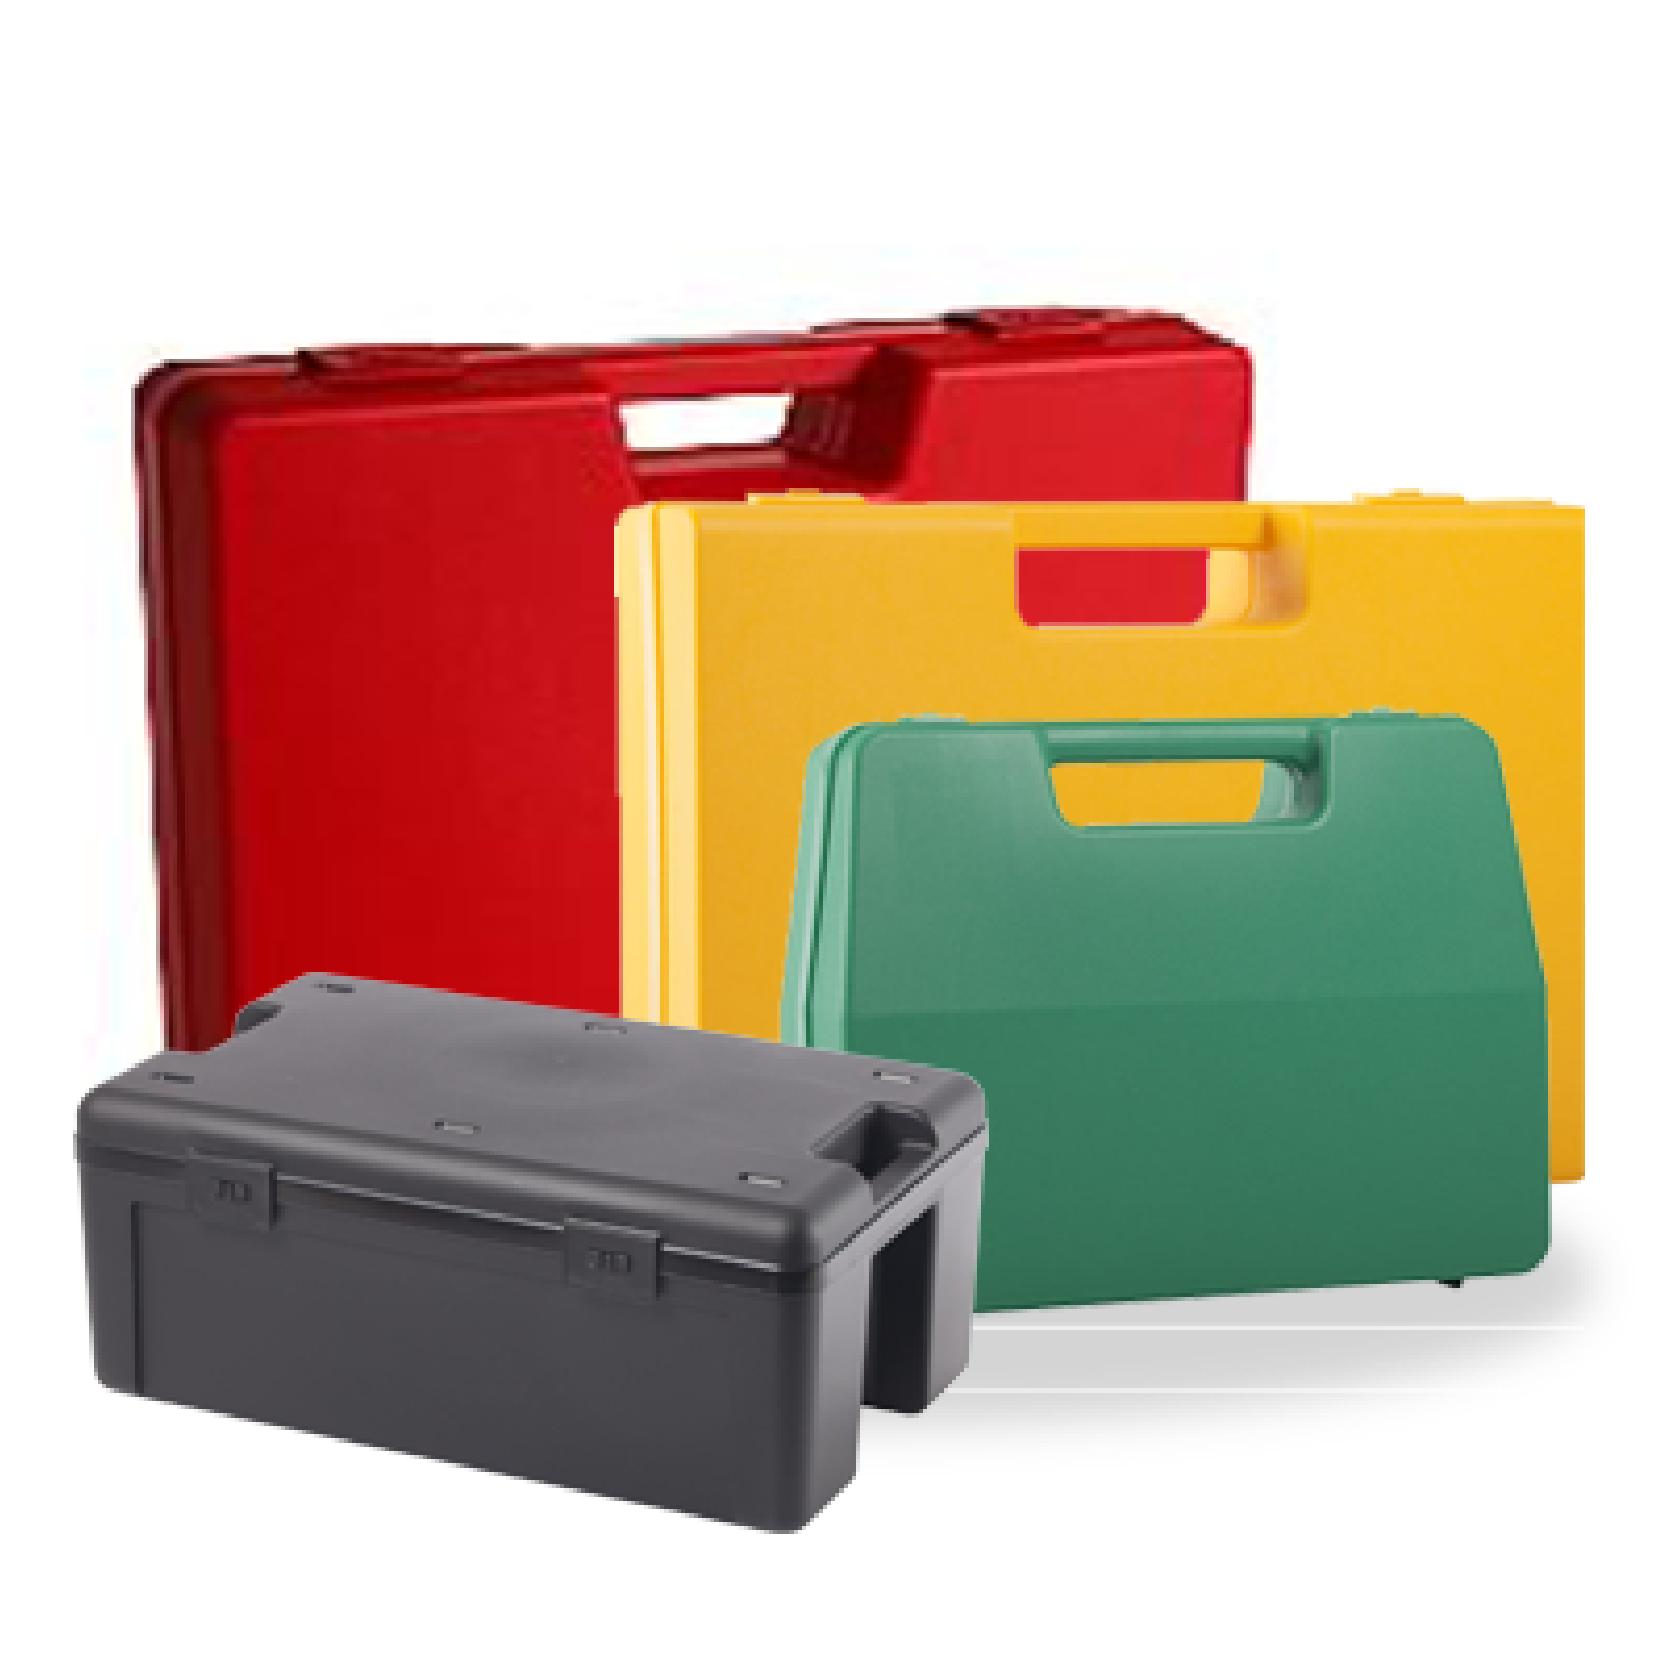 Gaggione eplasticase fabricant mallettes plastiques valises - technical cases boxes manufacturer